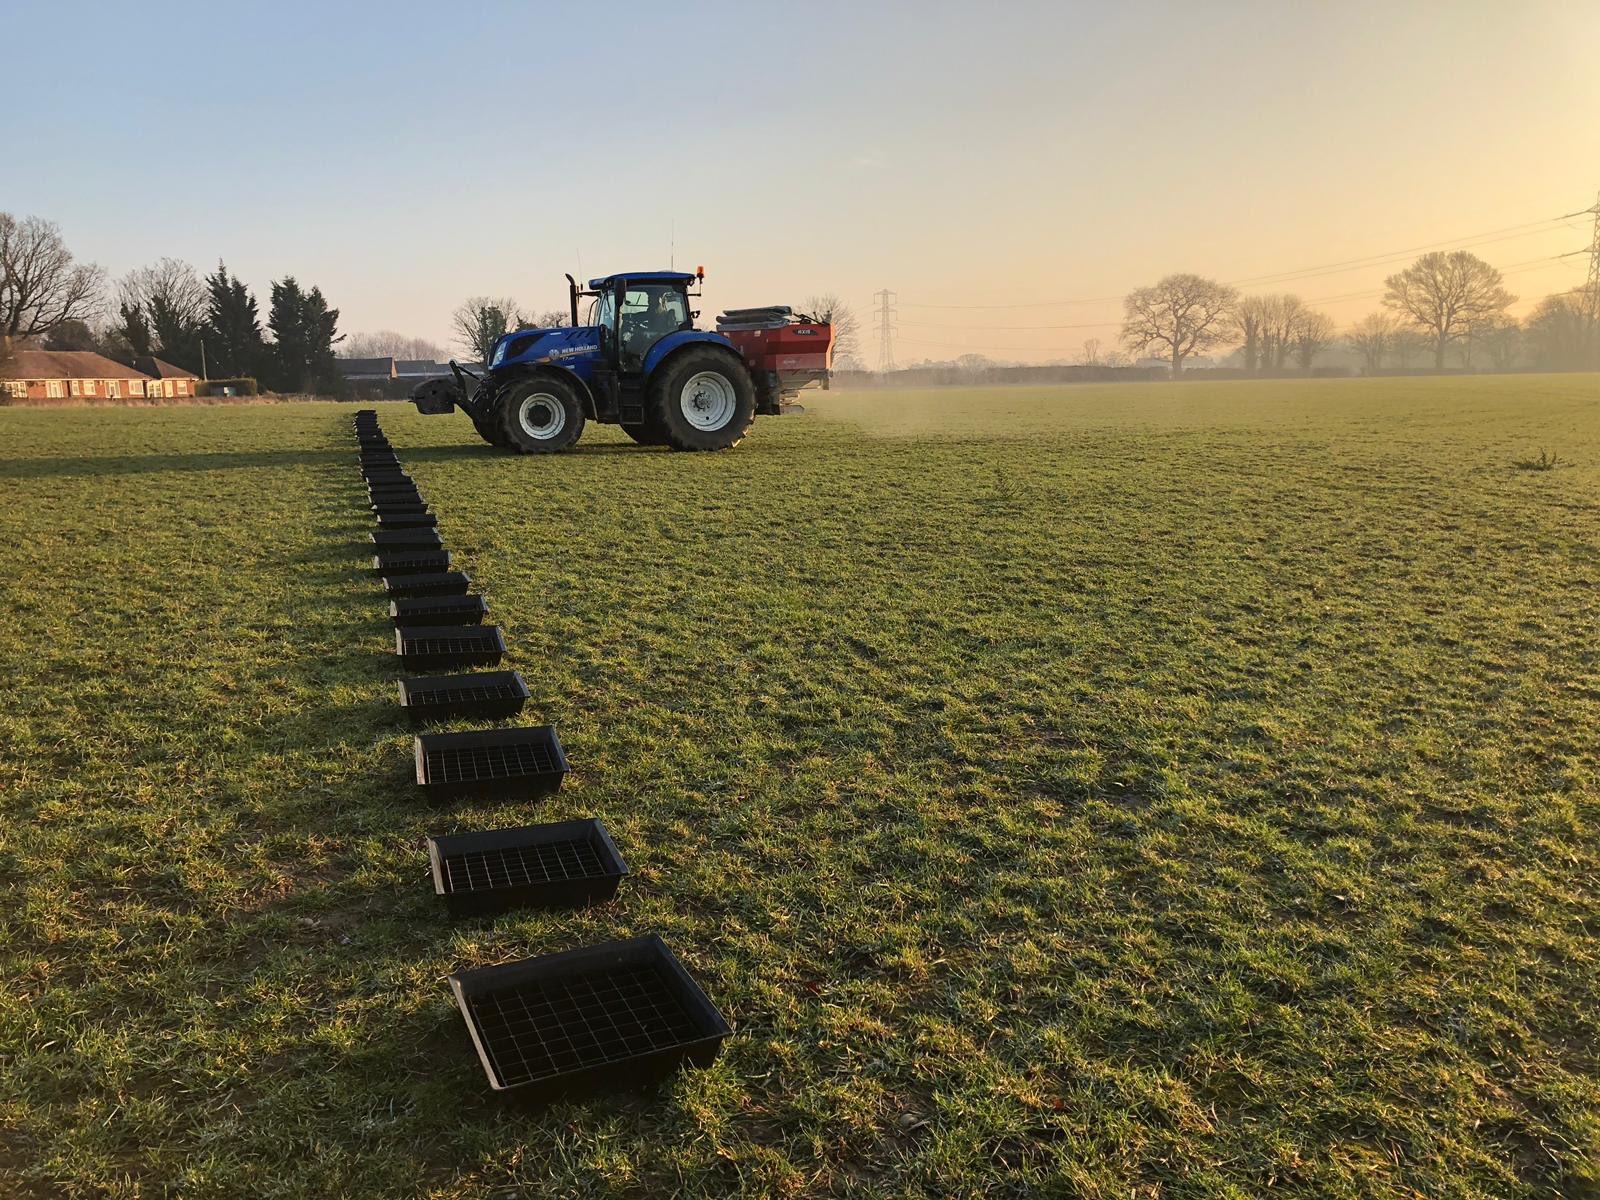 scs spreader calibration thomas bell diamond fertilisers